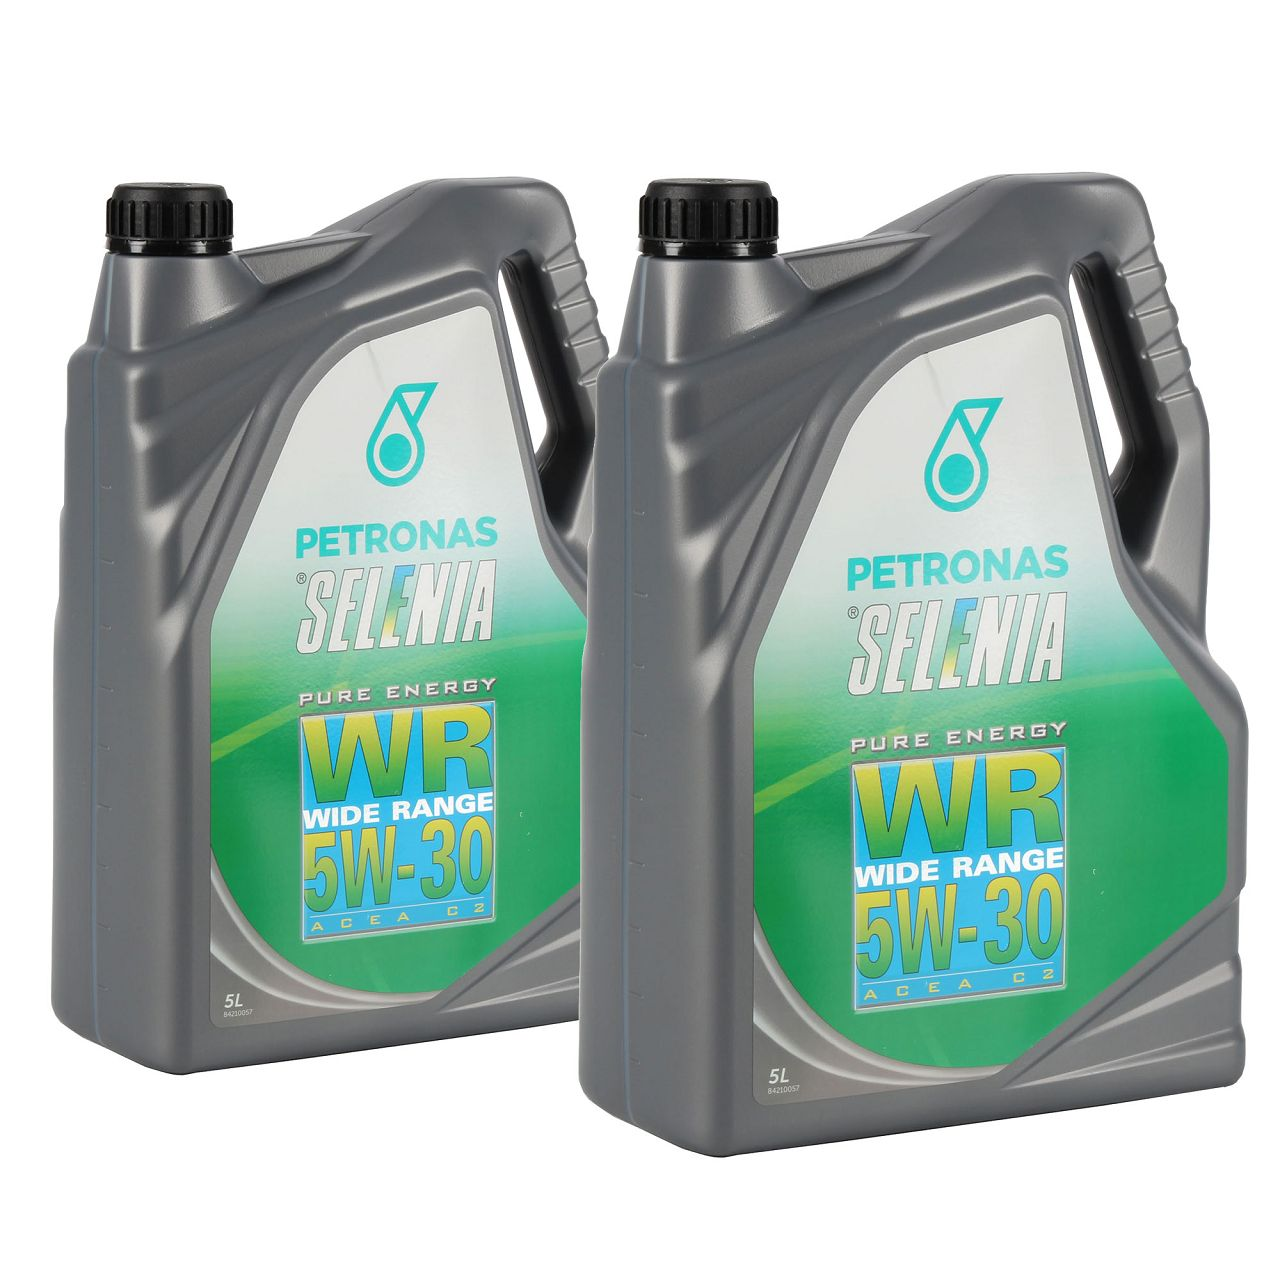 PETRONAS SELENIA Motoröl Öl WR PURE ENERGY 5W30 5W-30 Fiat 9.55535-S1 - 10 Liter